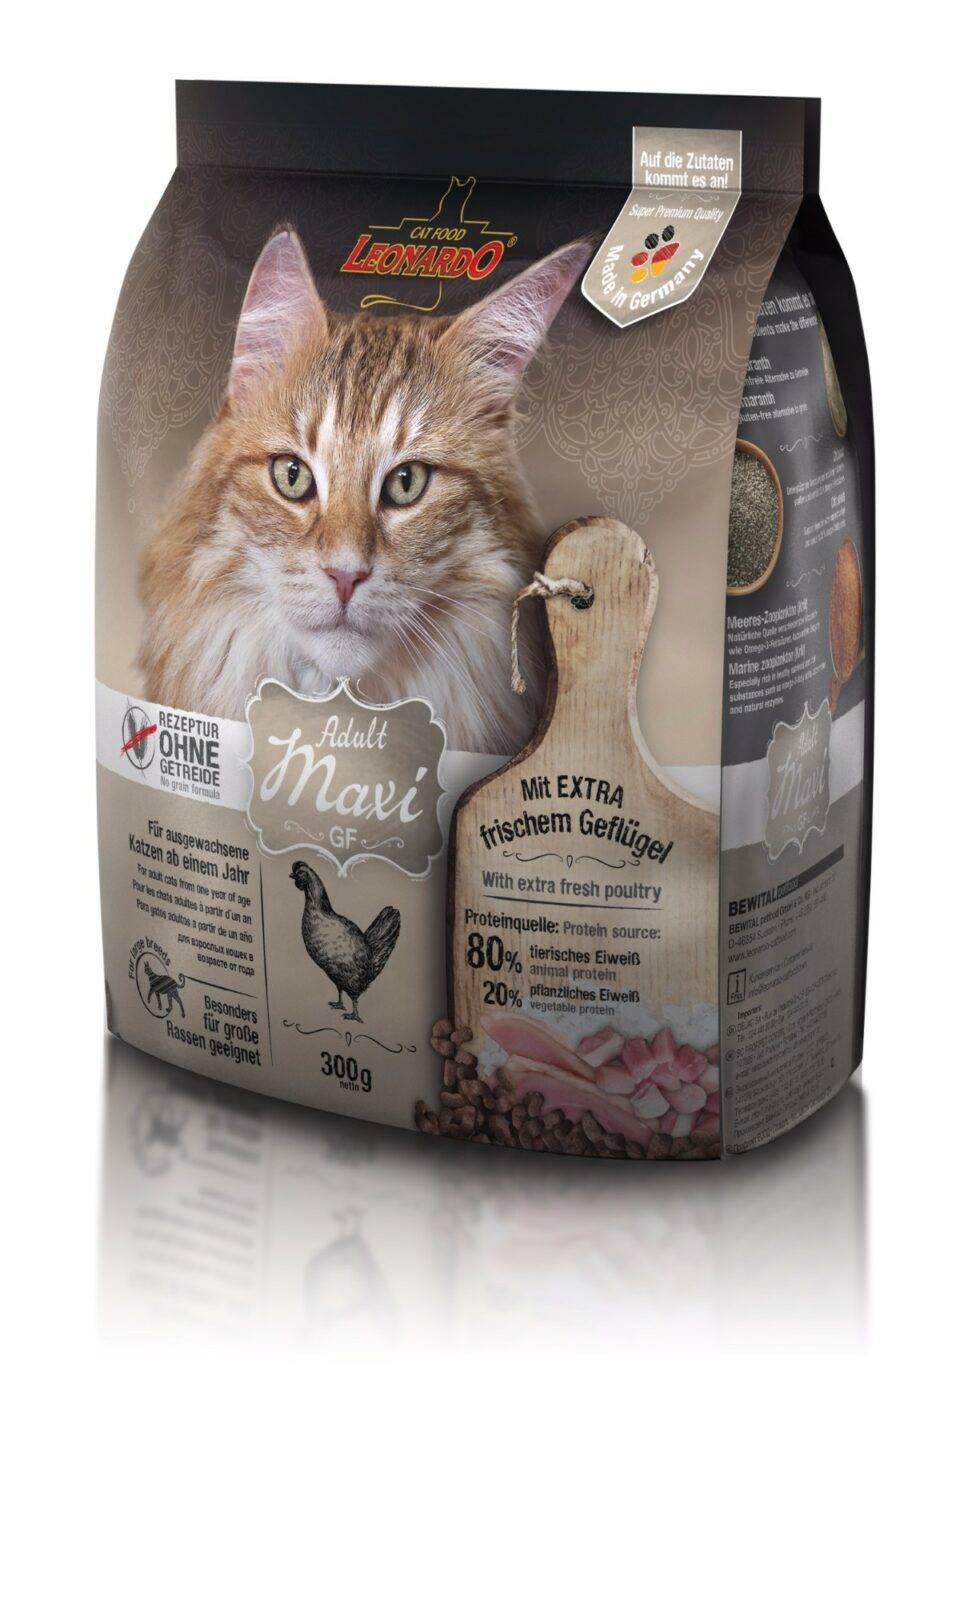 Состав сухого корма для кошек: разбор списка ингредиентов